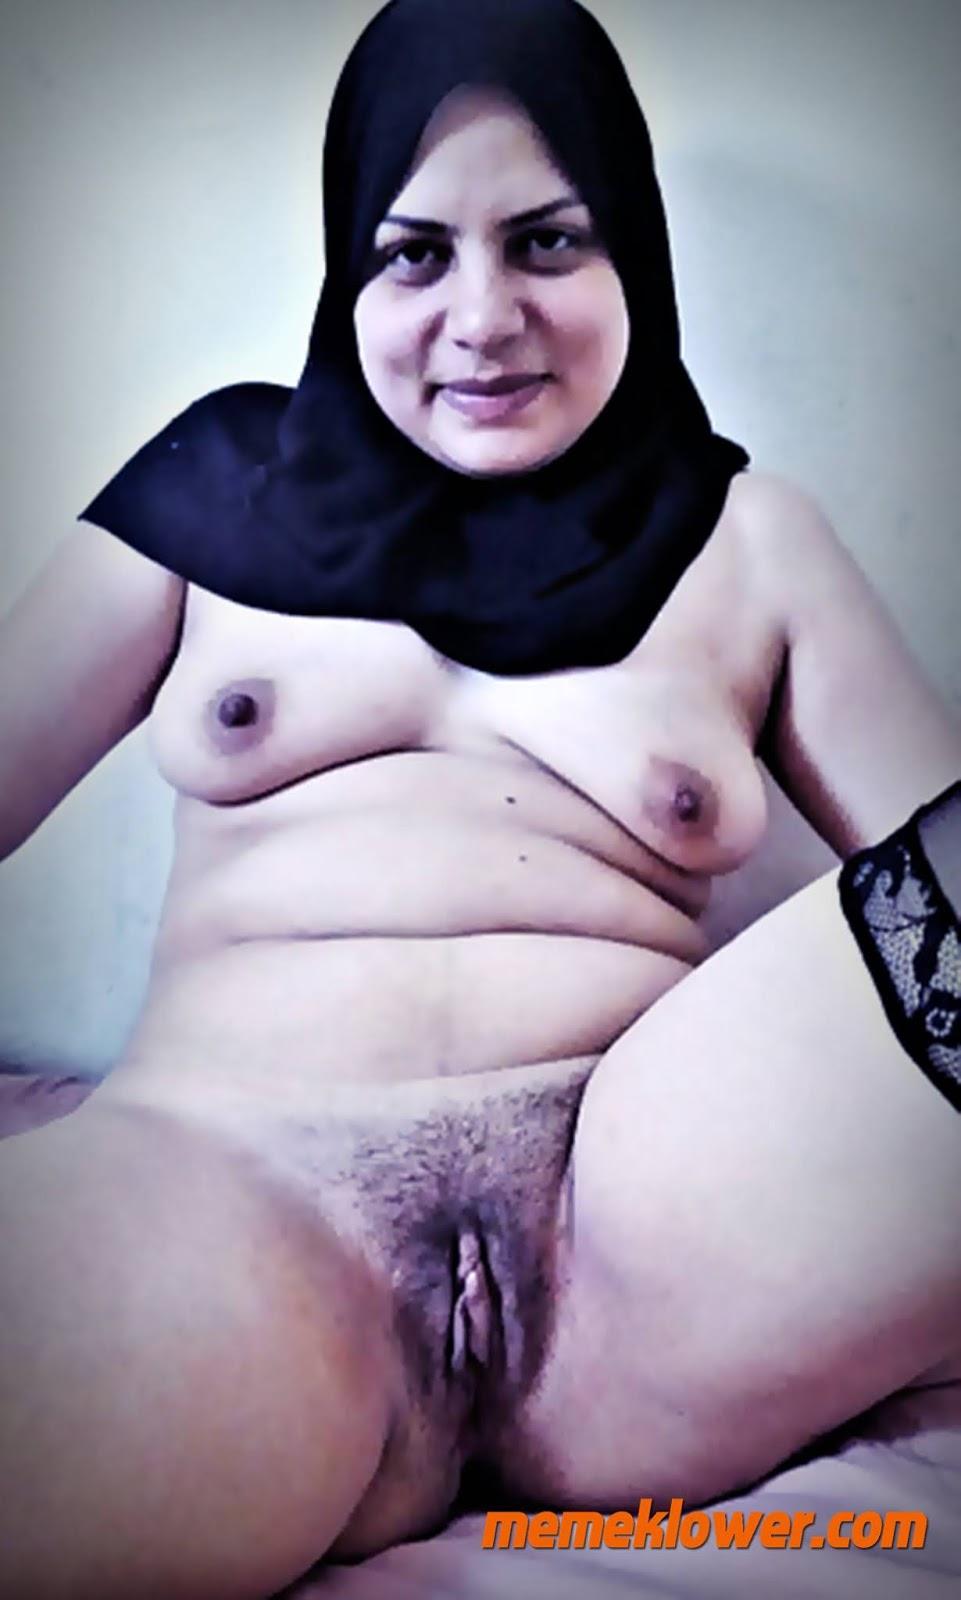 foto-bugil-tante-cantik-kerudung-masturbasi-2